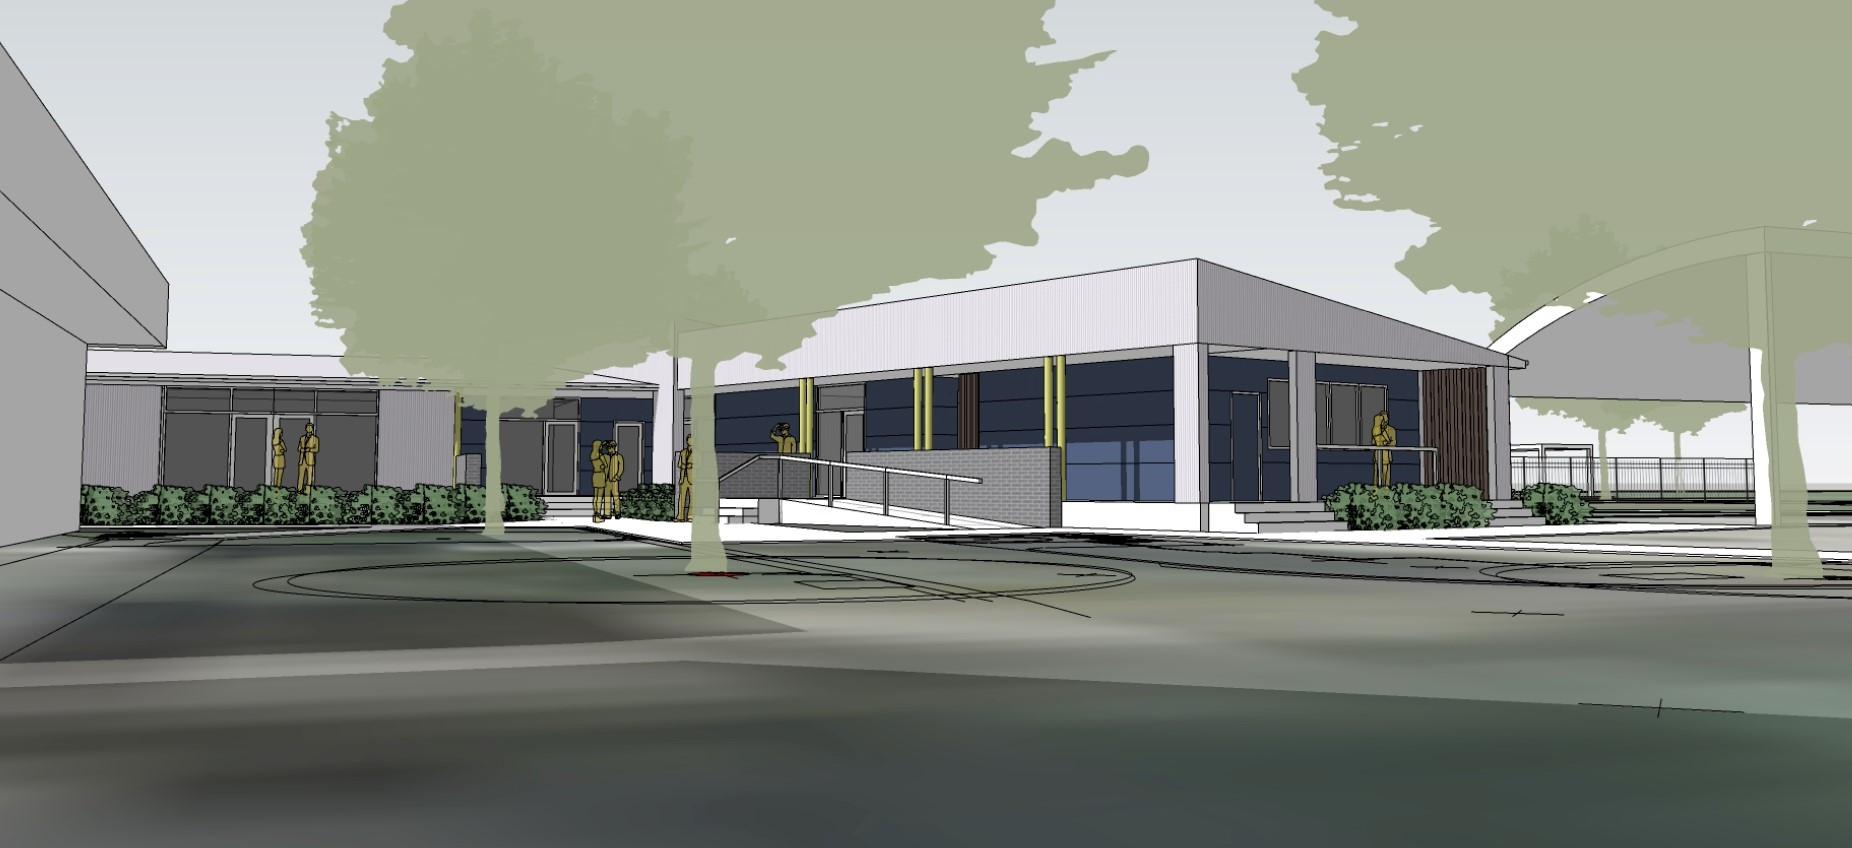 new building plans 2.jpg